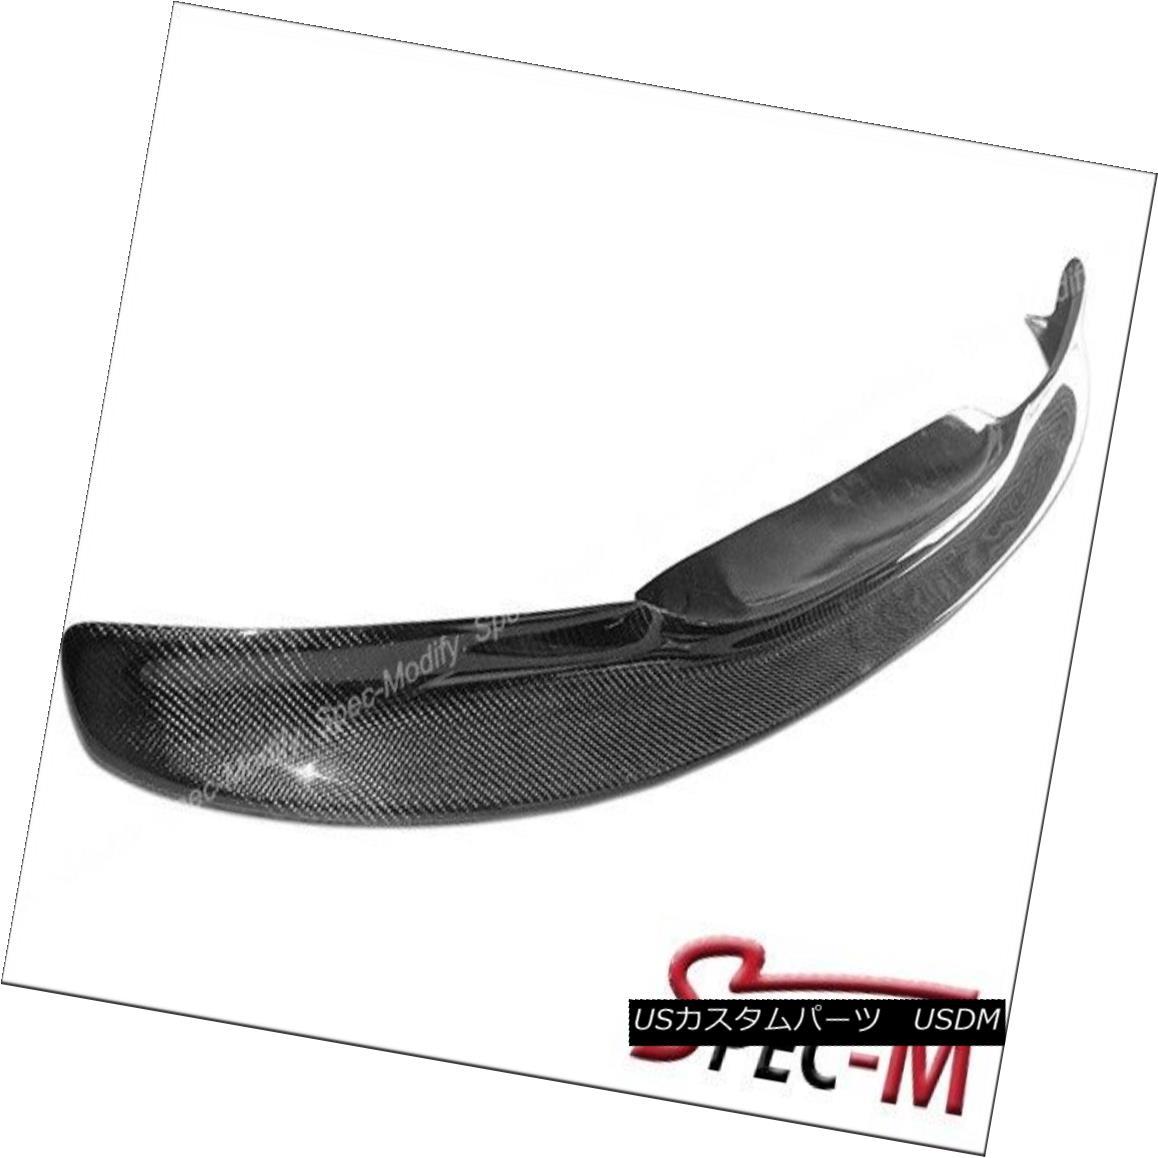 CSL Style Carbon Fiber Front Bumper Spoiler Lip For BMW 2001-2006 E46 M3 Only